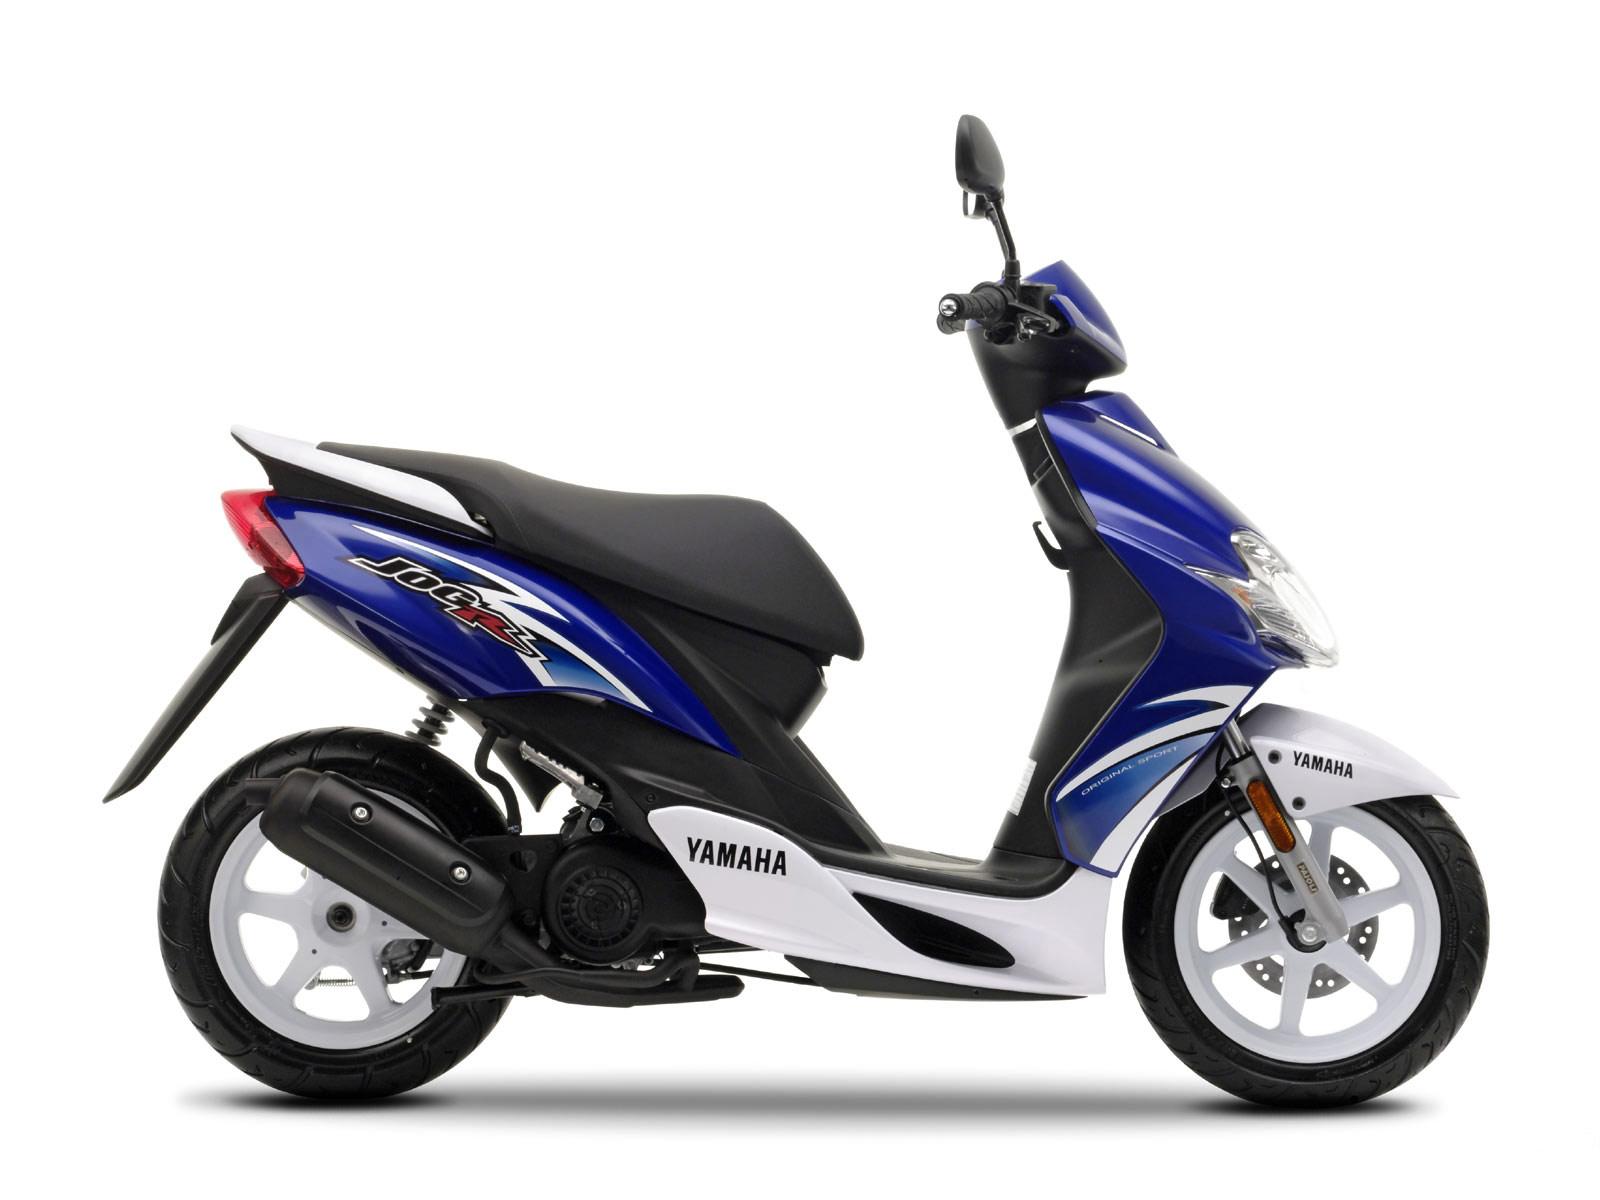 Yamaha Aerox R Cc Top Speed